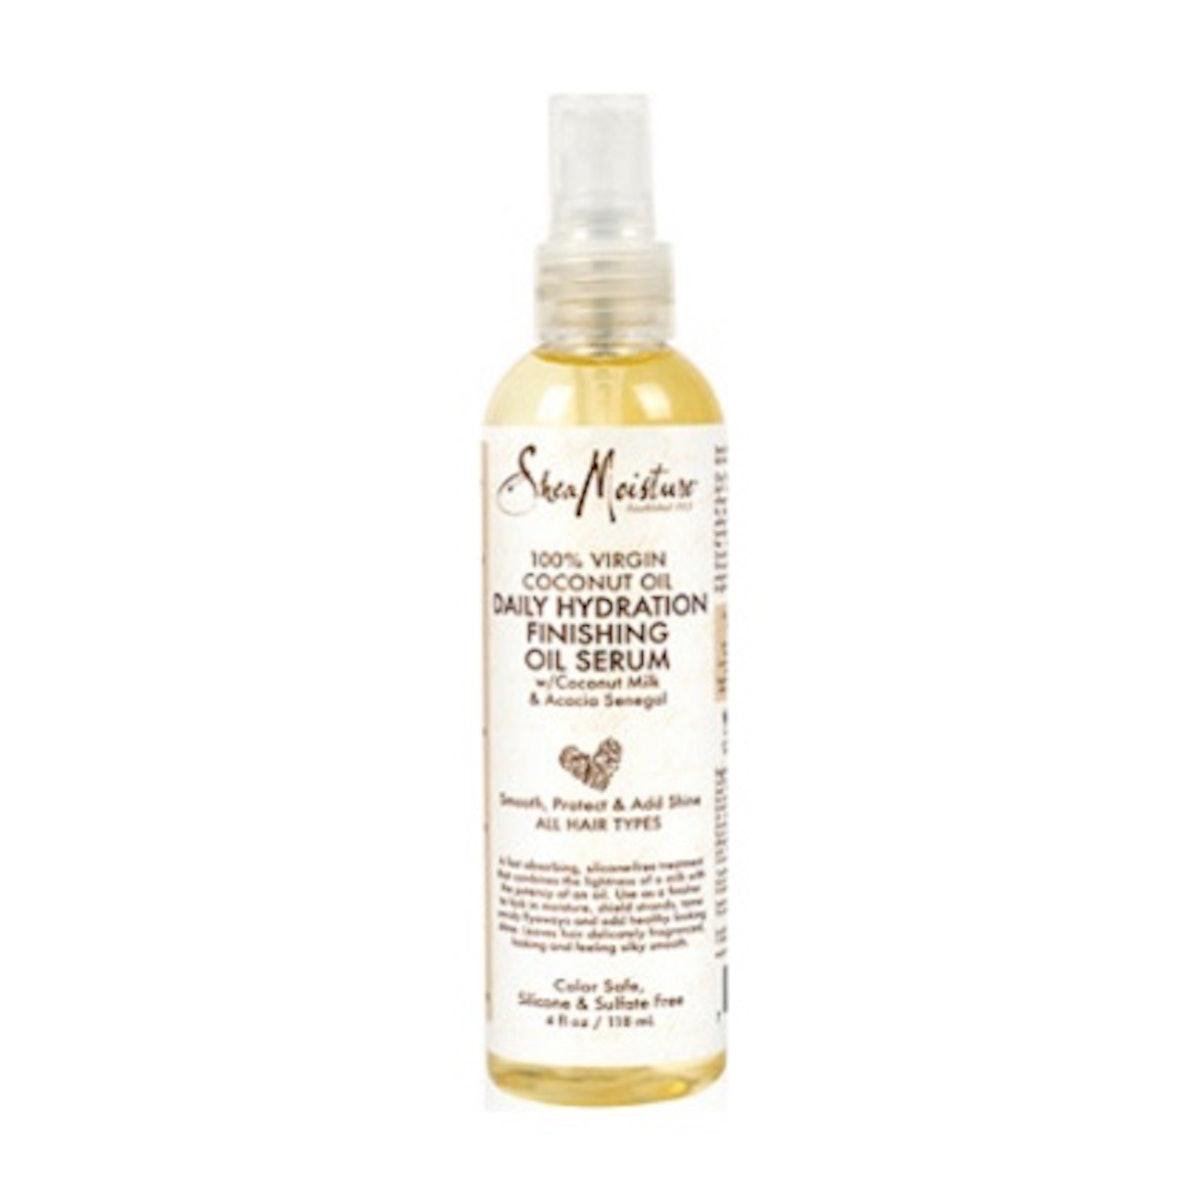 SheaMoisture 100% Virgin Coconut Oil Daily Hydration Finishing Oil Serum